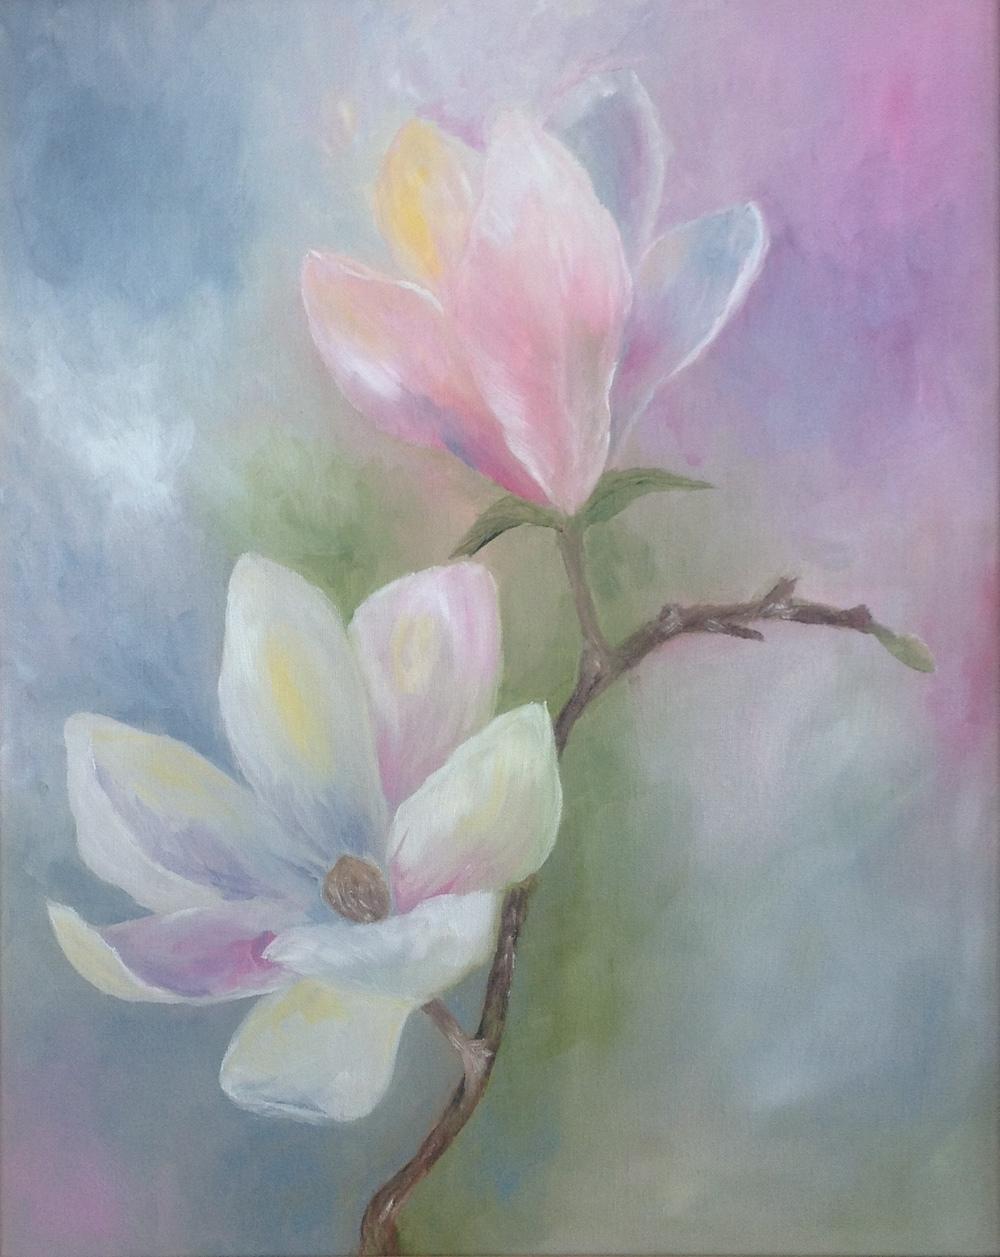 Magnolias Heralding Spring